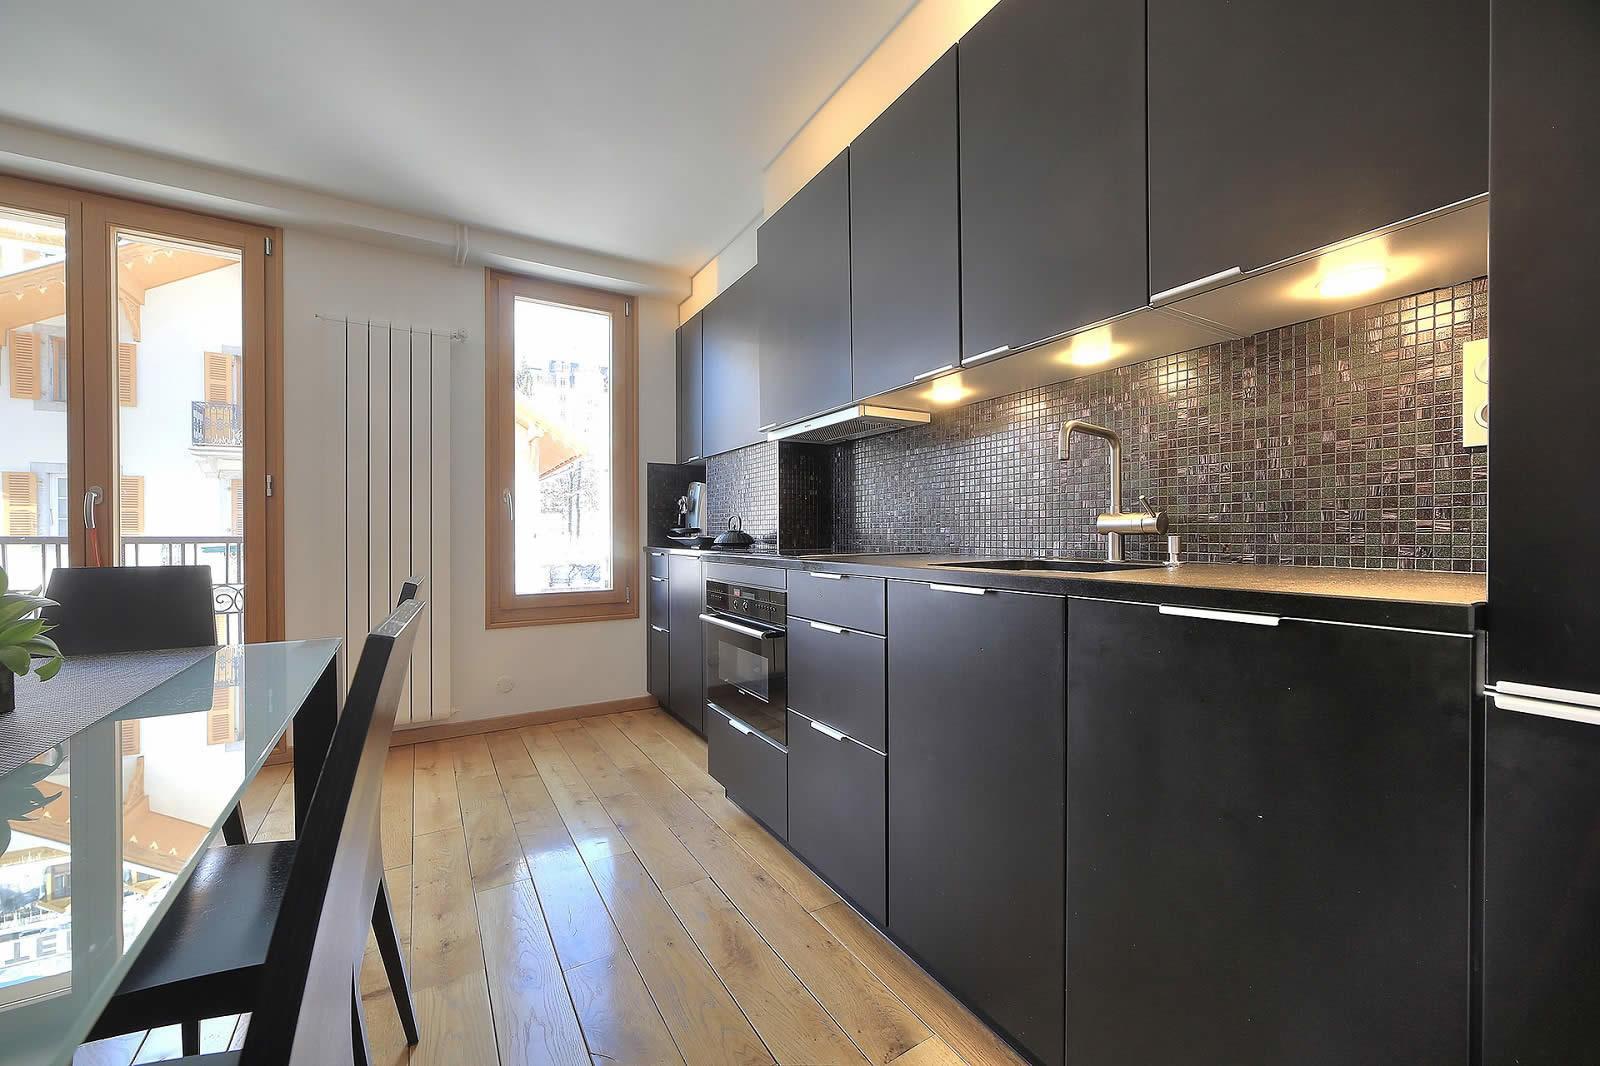 appartement-a-vendre-cuisine-equipee-balcon